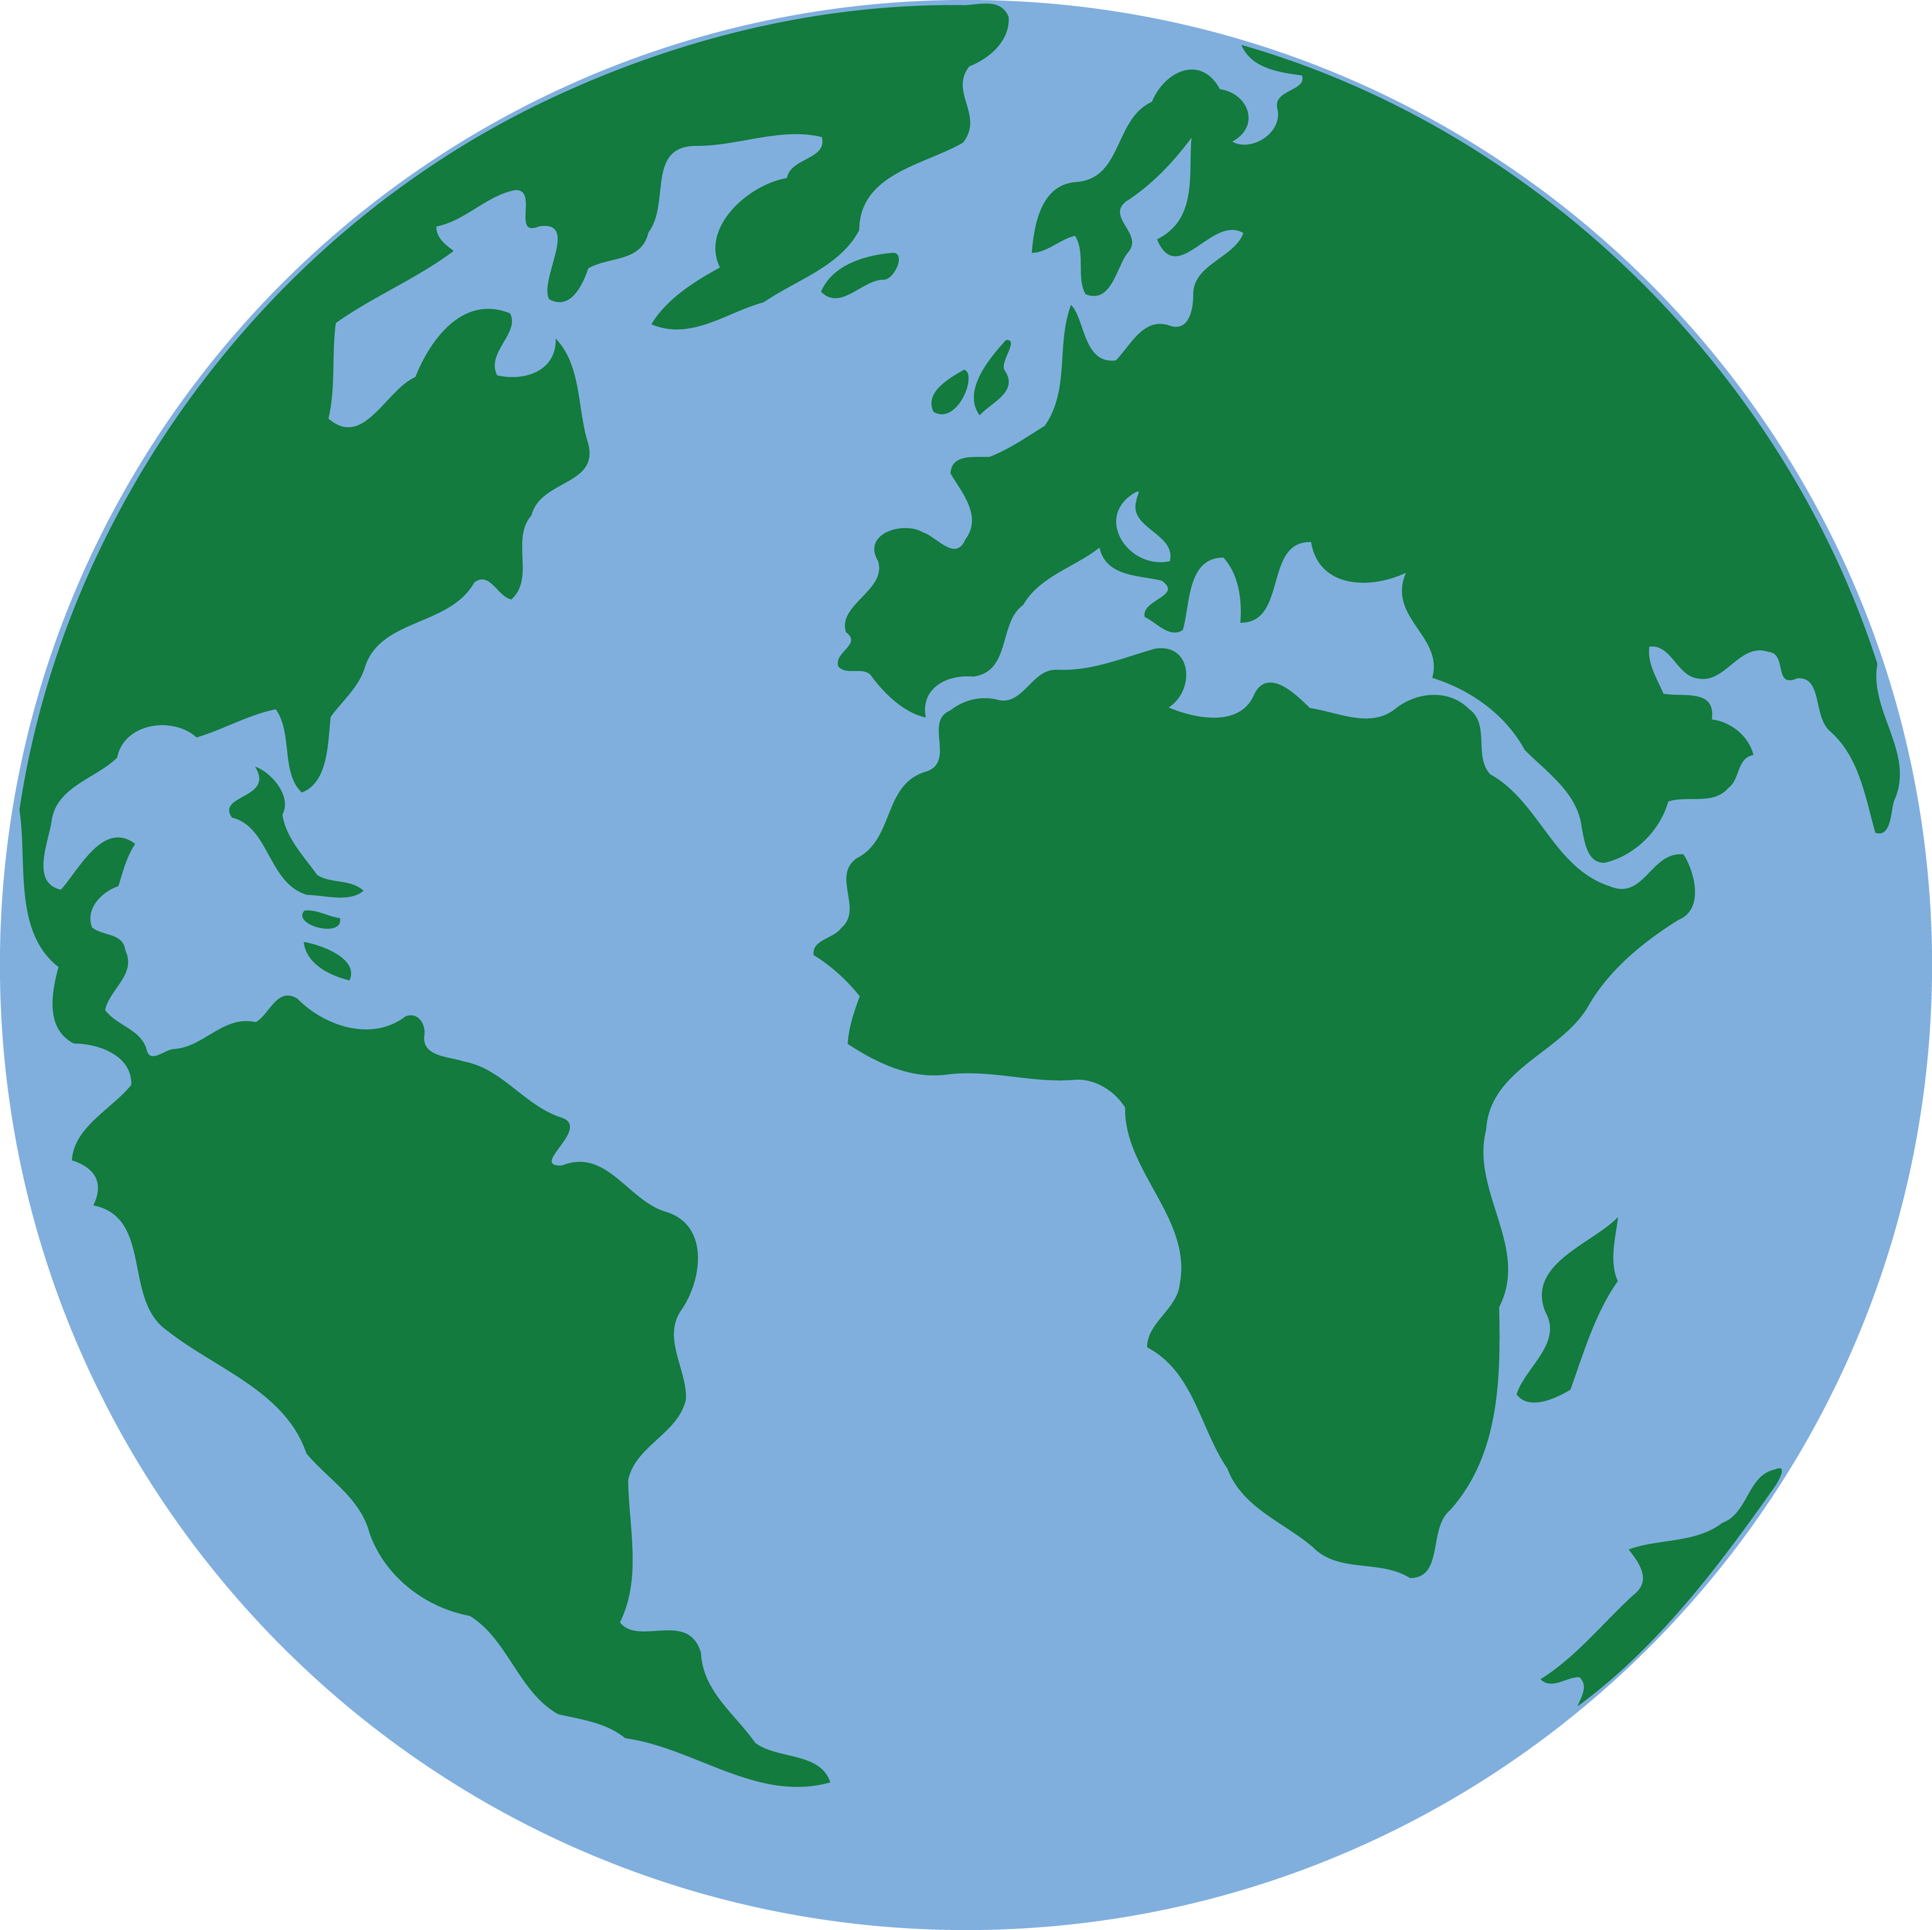 Globe clip art green. Clipart earth pastel